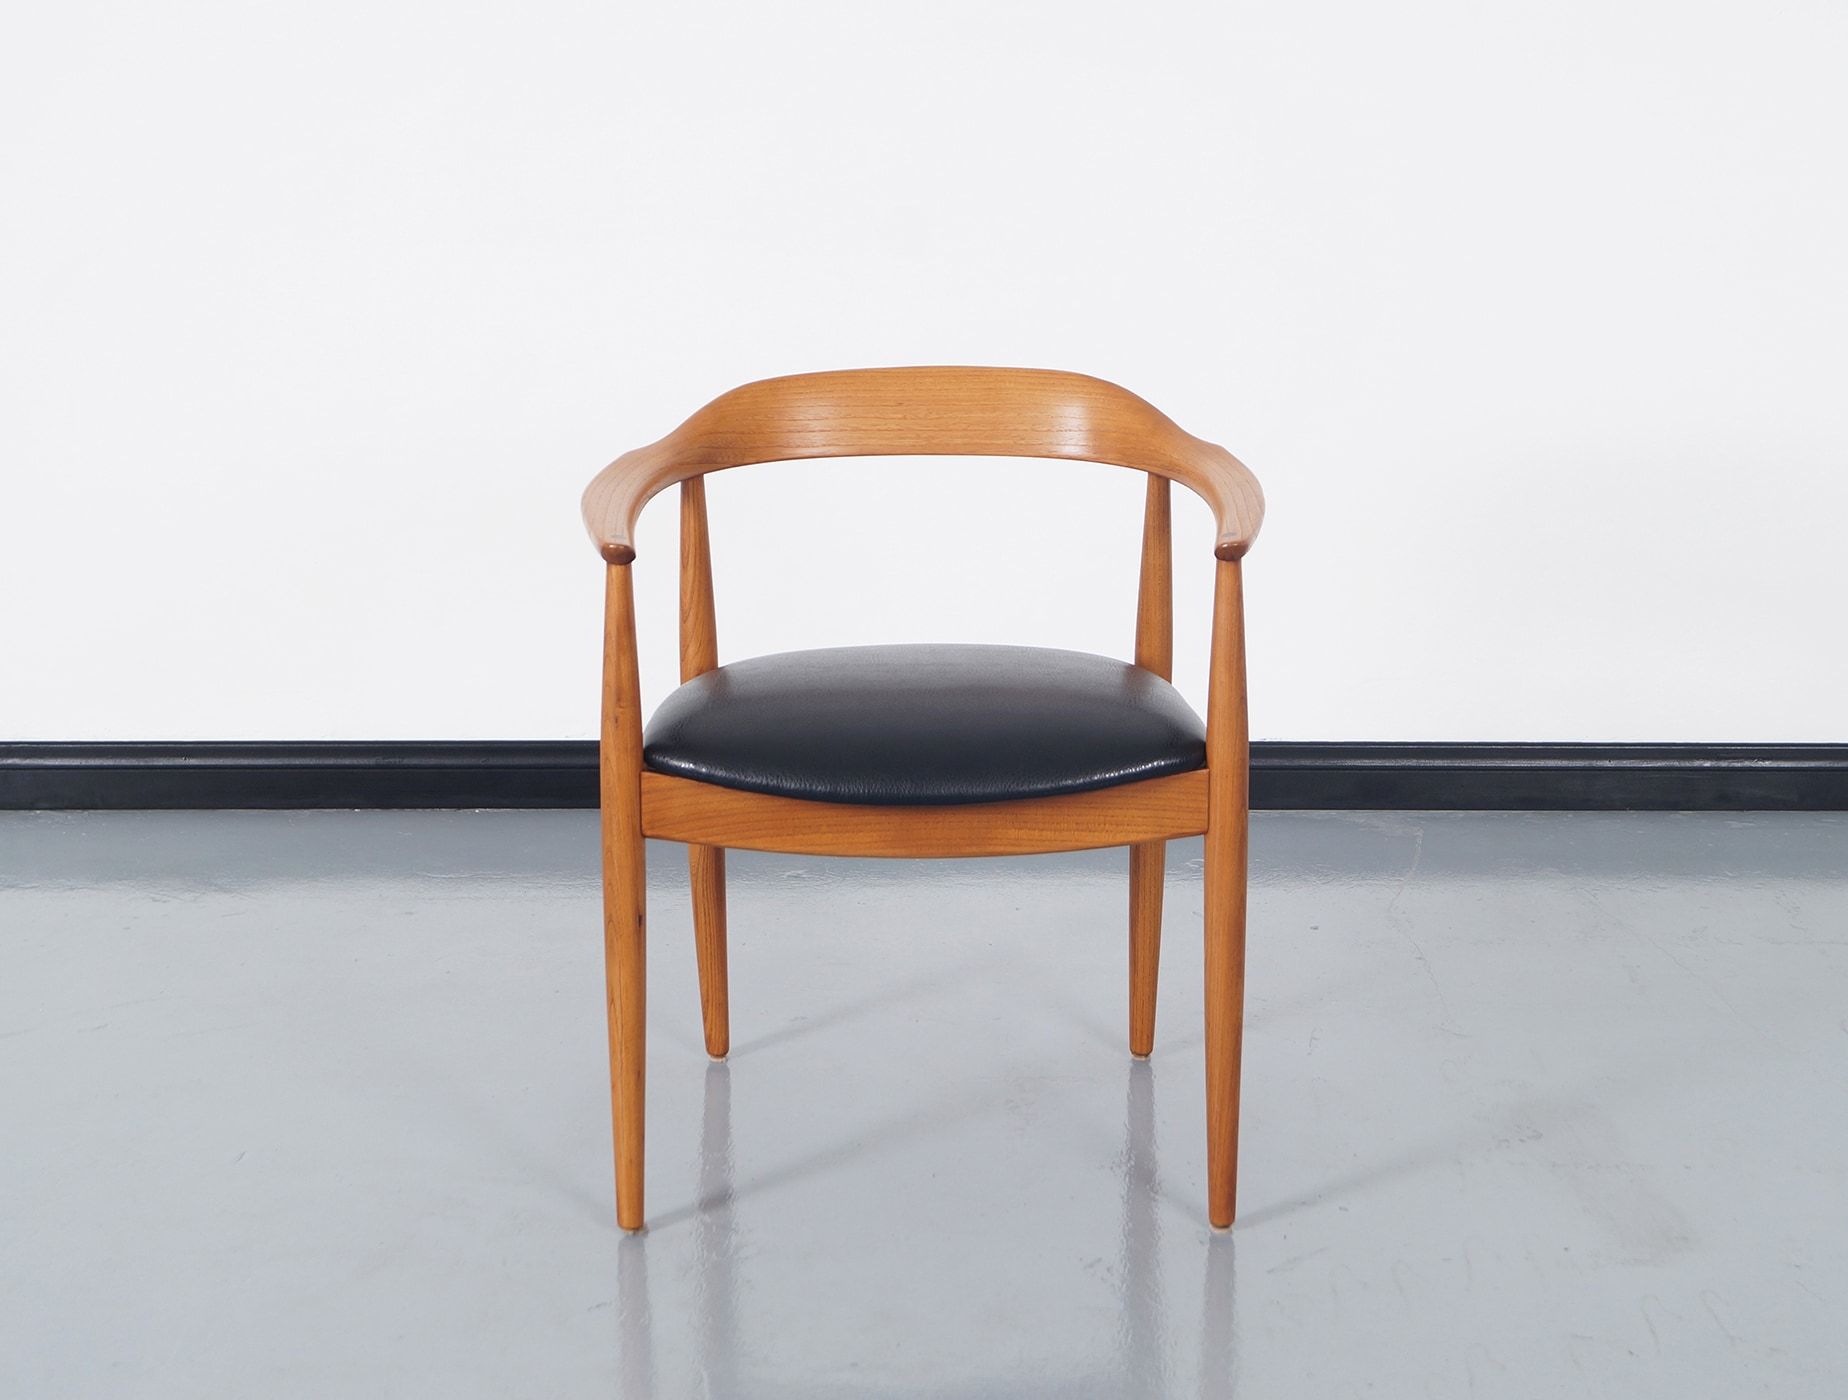 Danish Modern Dining Chairs by Niels Eilersen